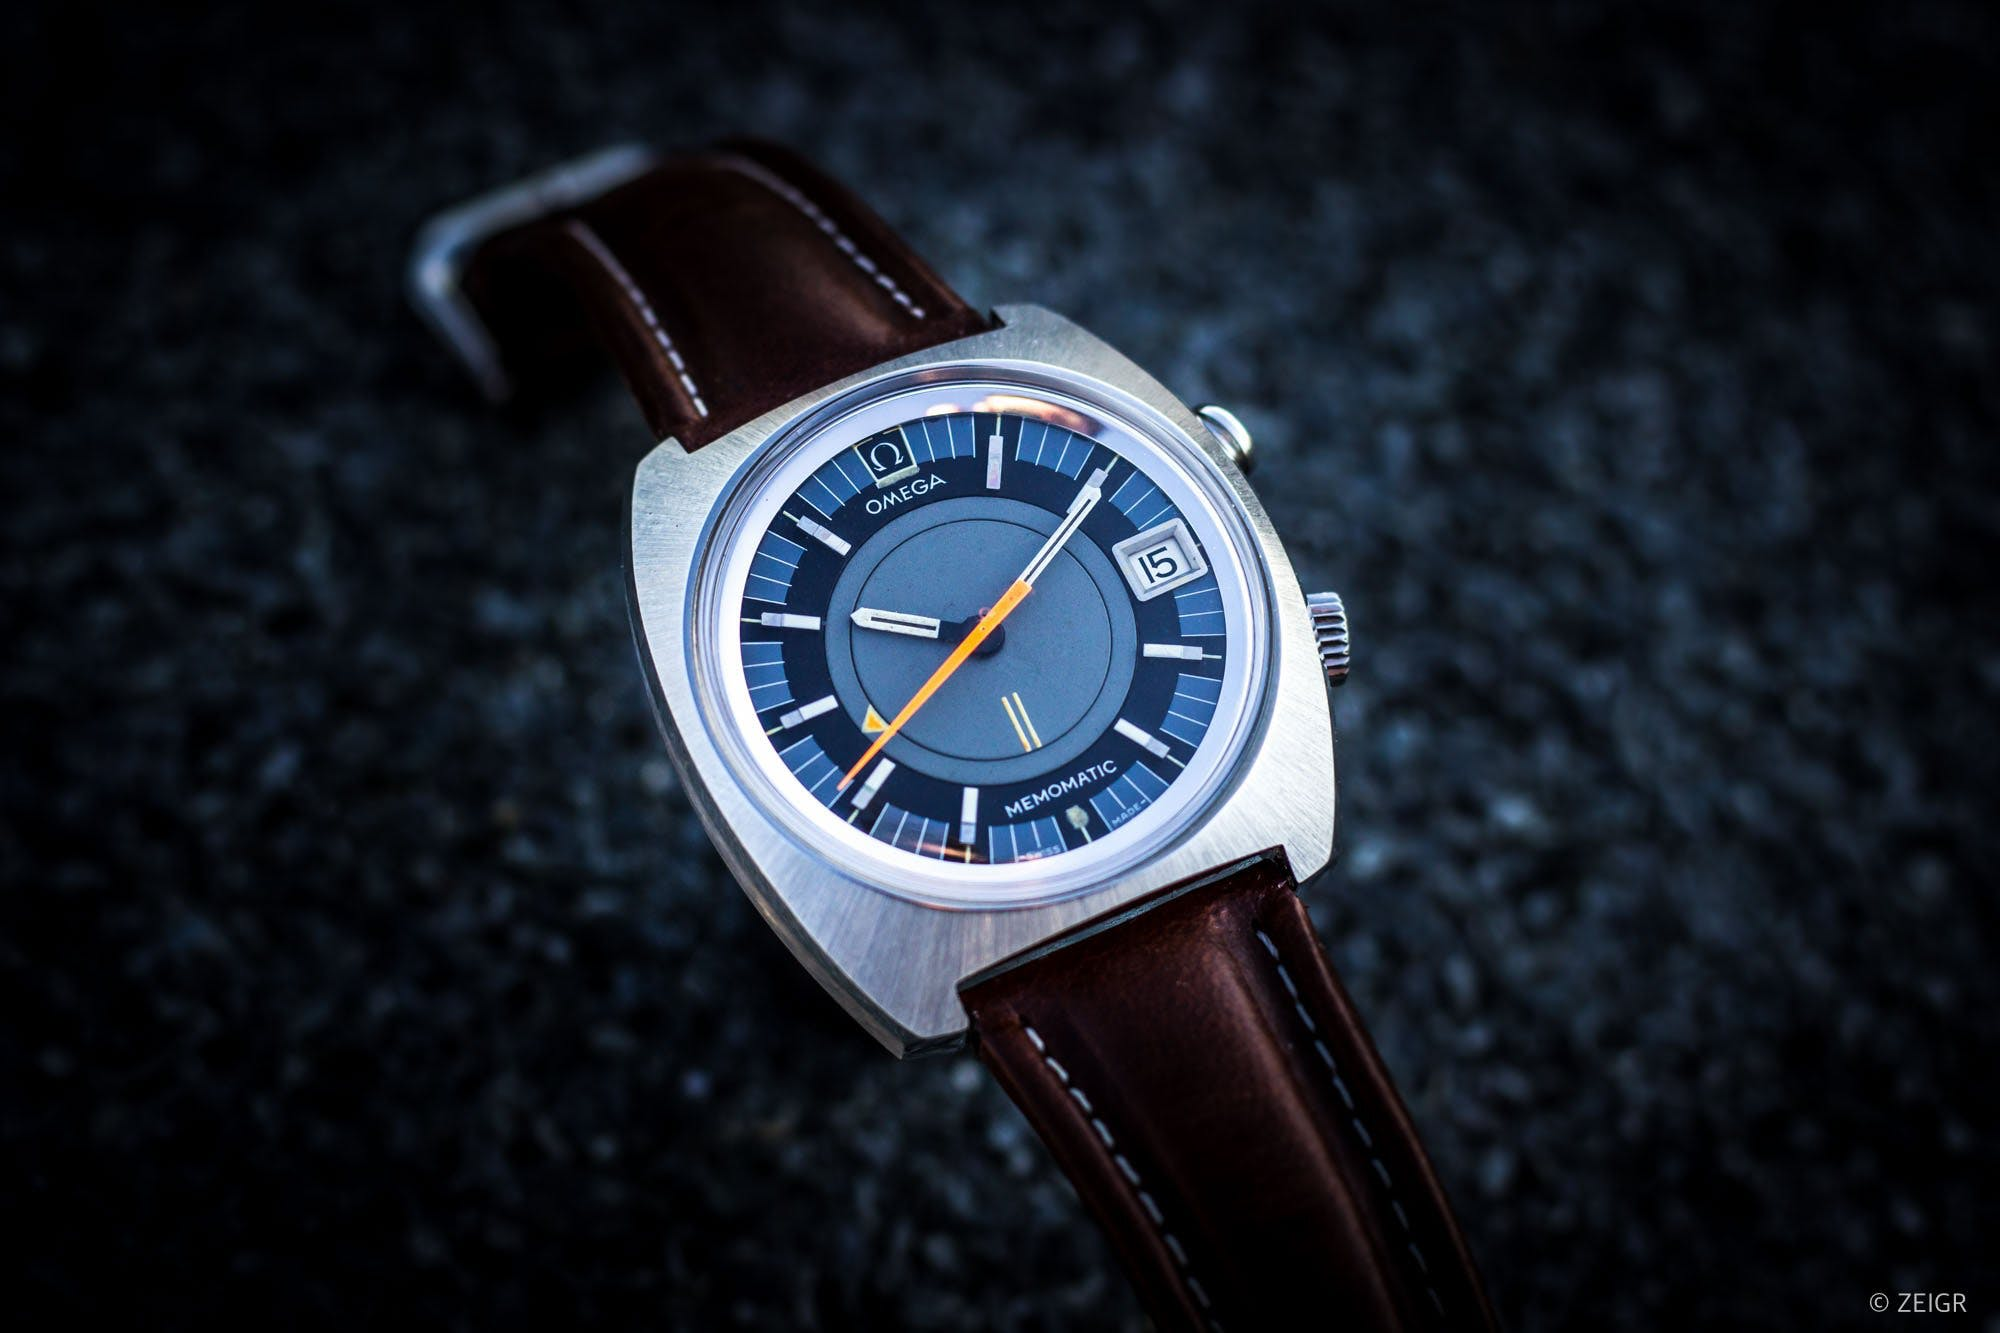 Omega Memomatic alarm watch, Image: Zeigr